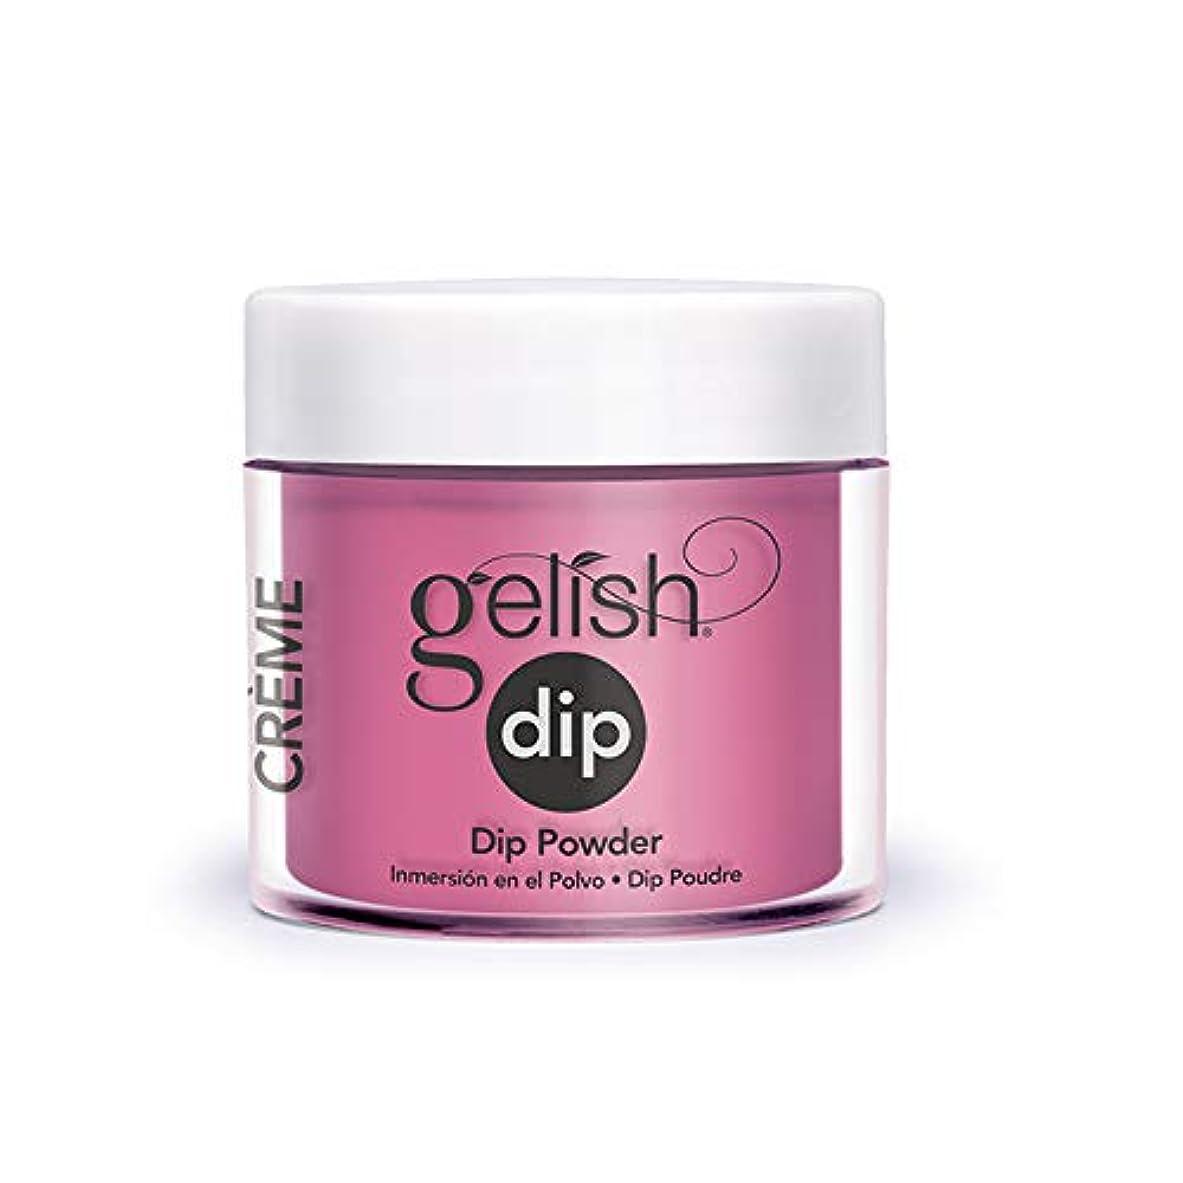 潮飛行場統合Harmony Gelish - Acrylic Dip Powder - Tropical Punch - 23g / 0.8oz